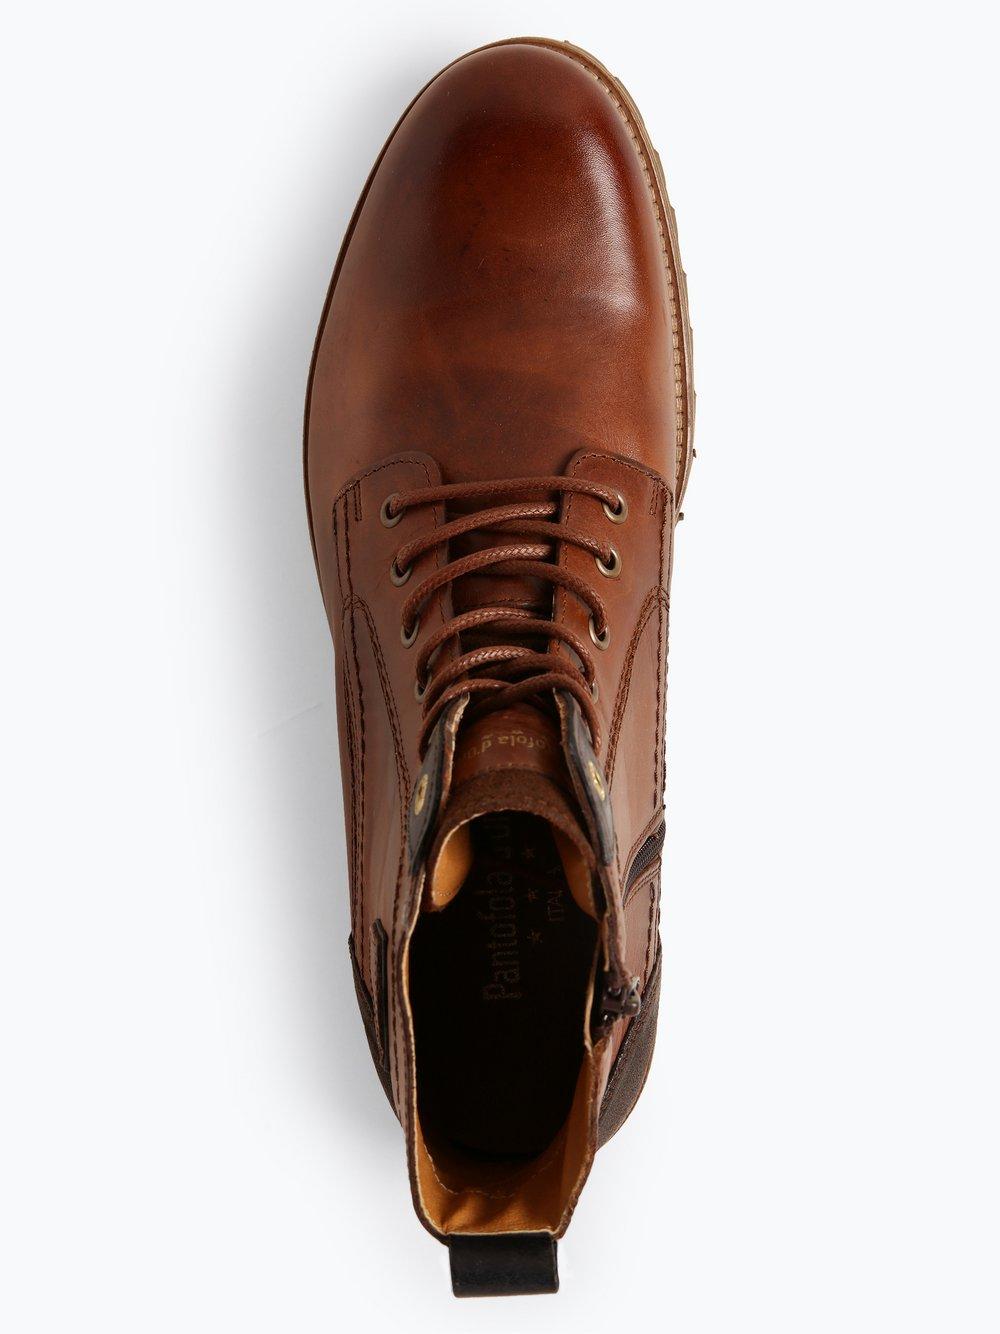 Boots Ponzamo Leder Herren Pantofola Aus D'oro Online UMpzVGqS